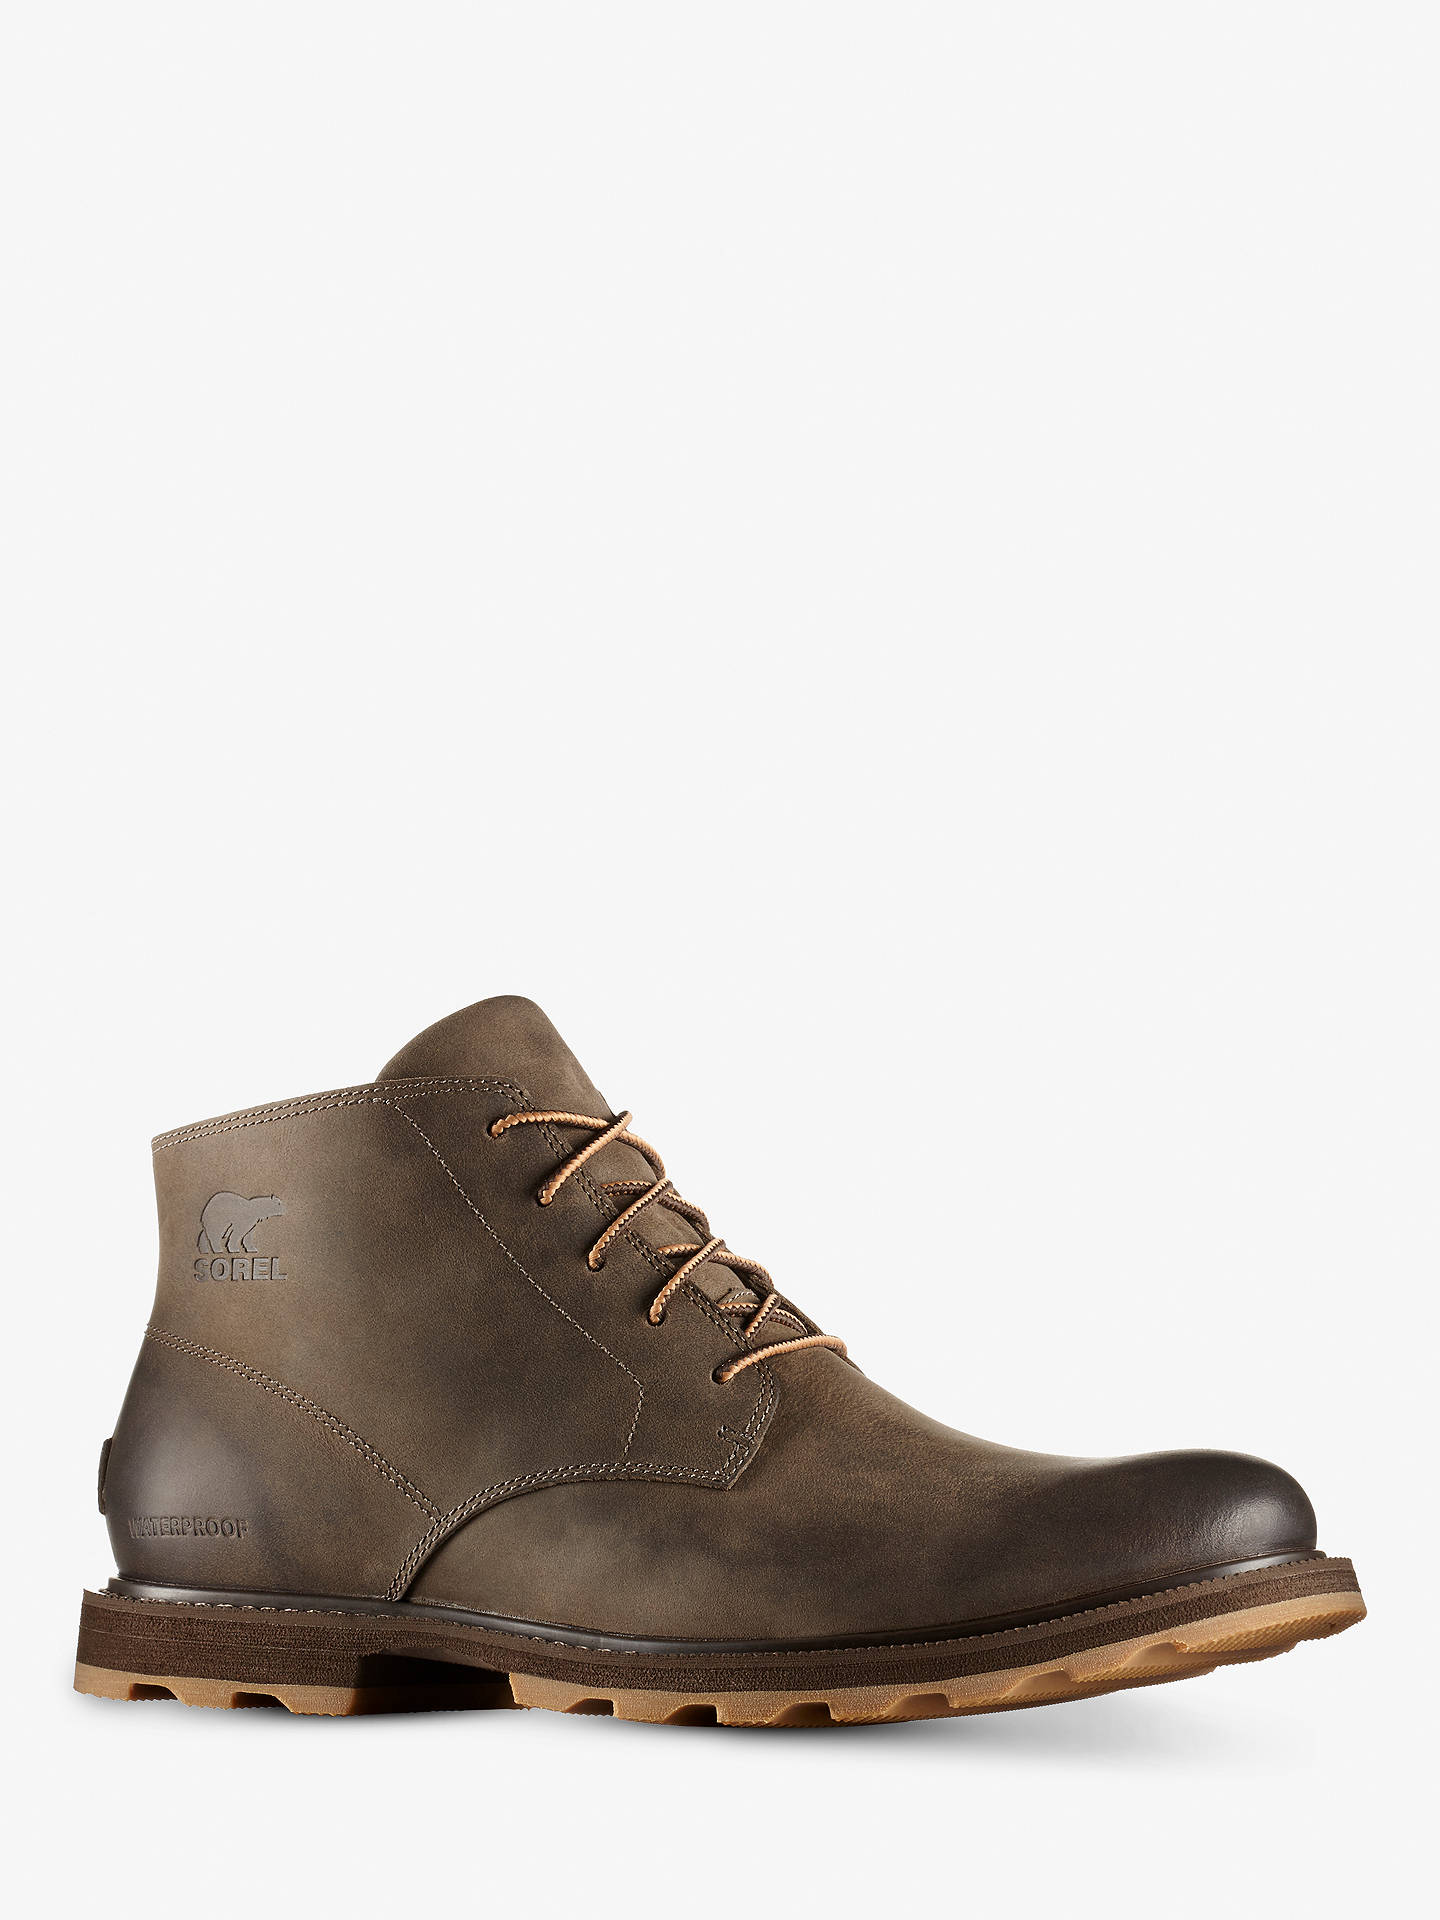 2fda63d465f SOREL Madson Waterproof Chukka Boots, Major at John Lewis & Partners